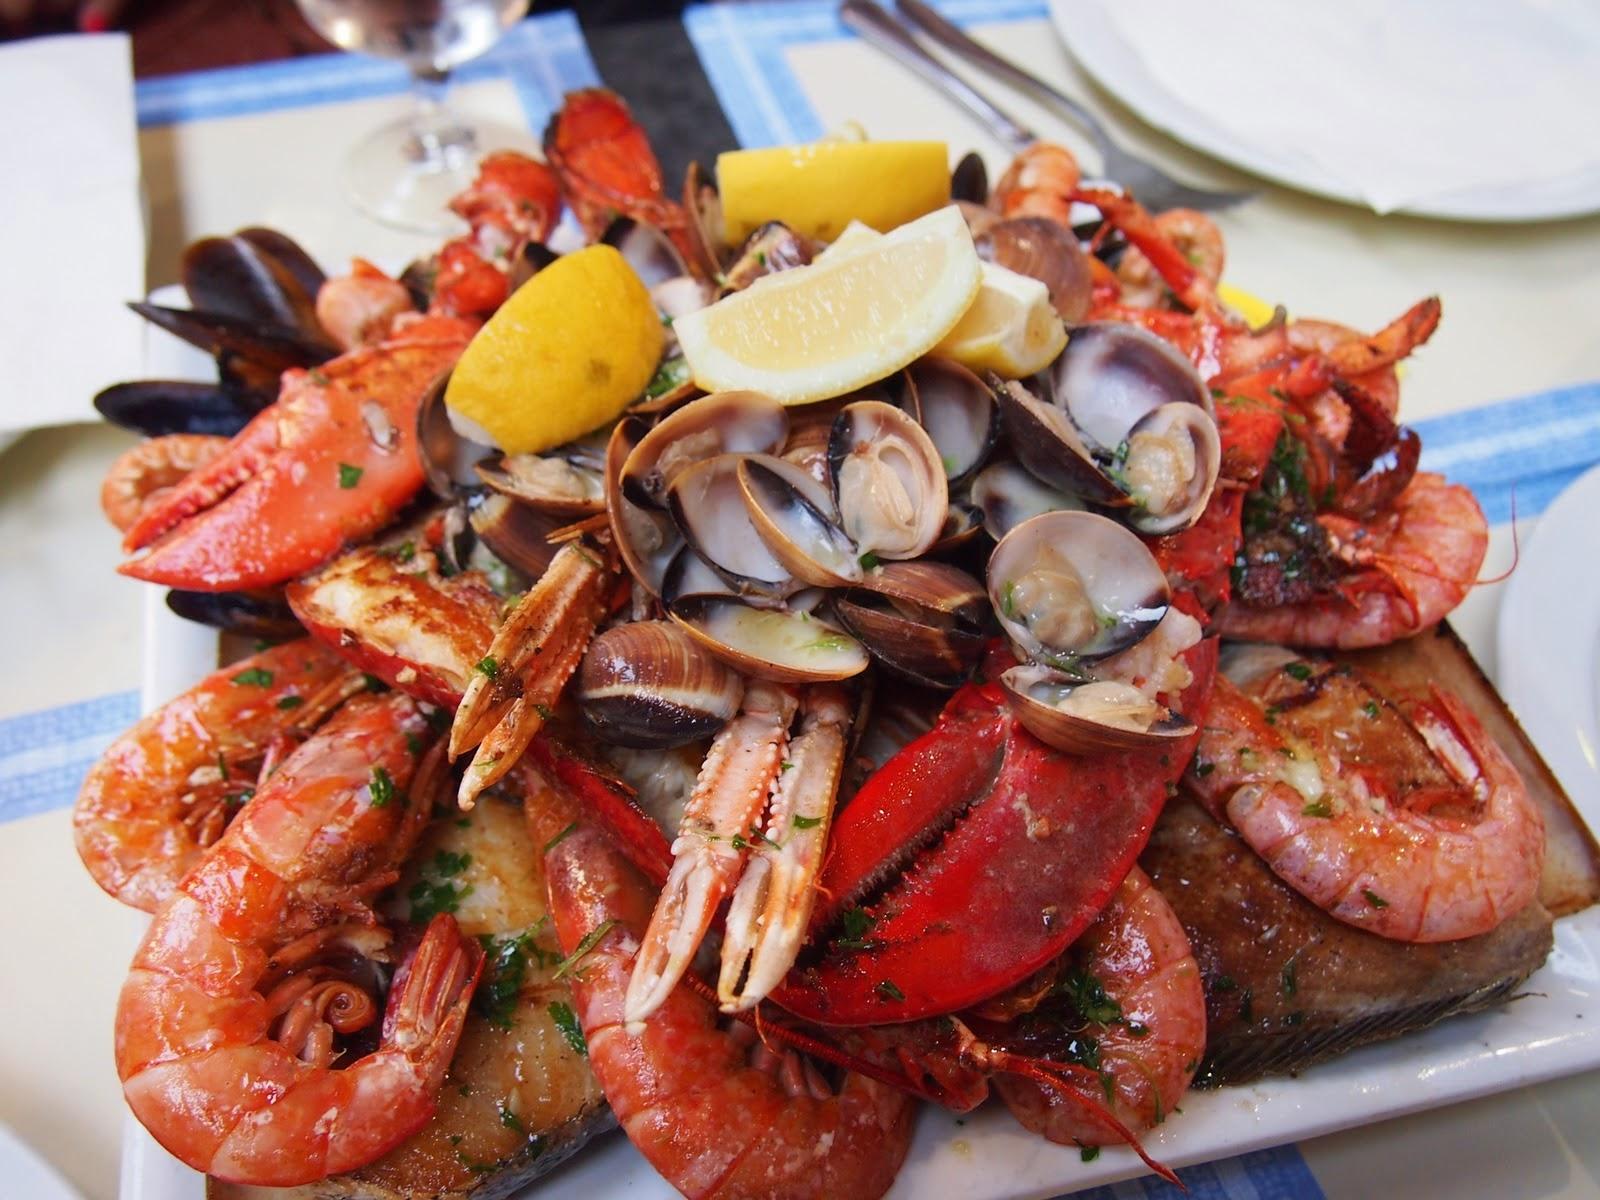 Giant Food Market Seafood